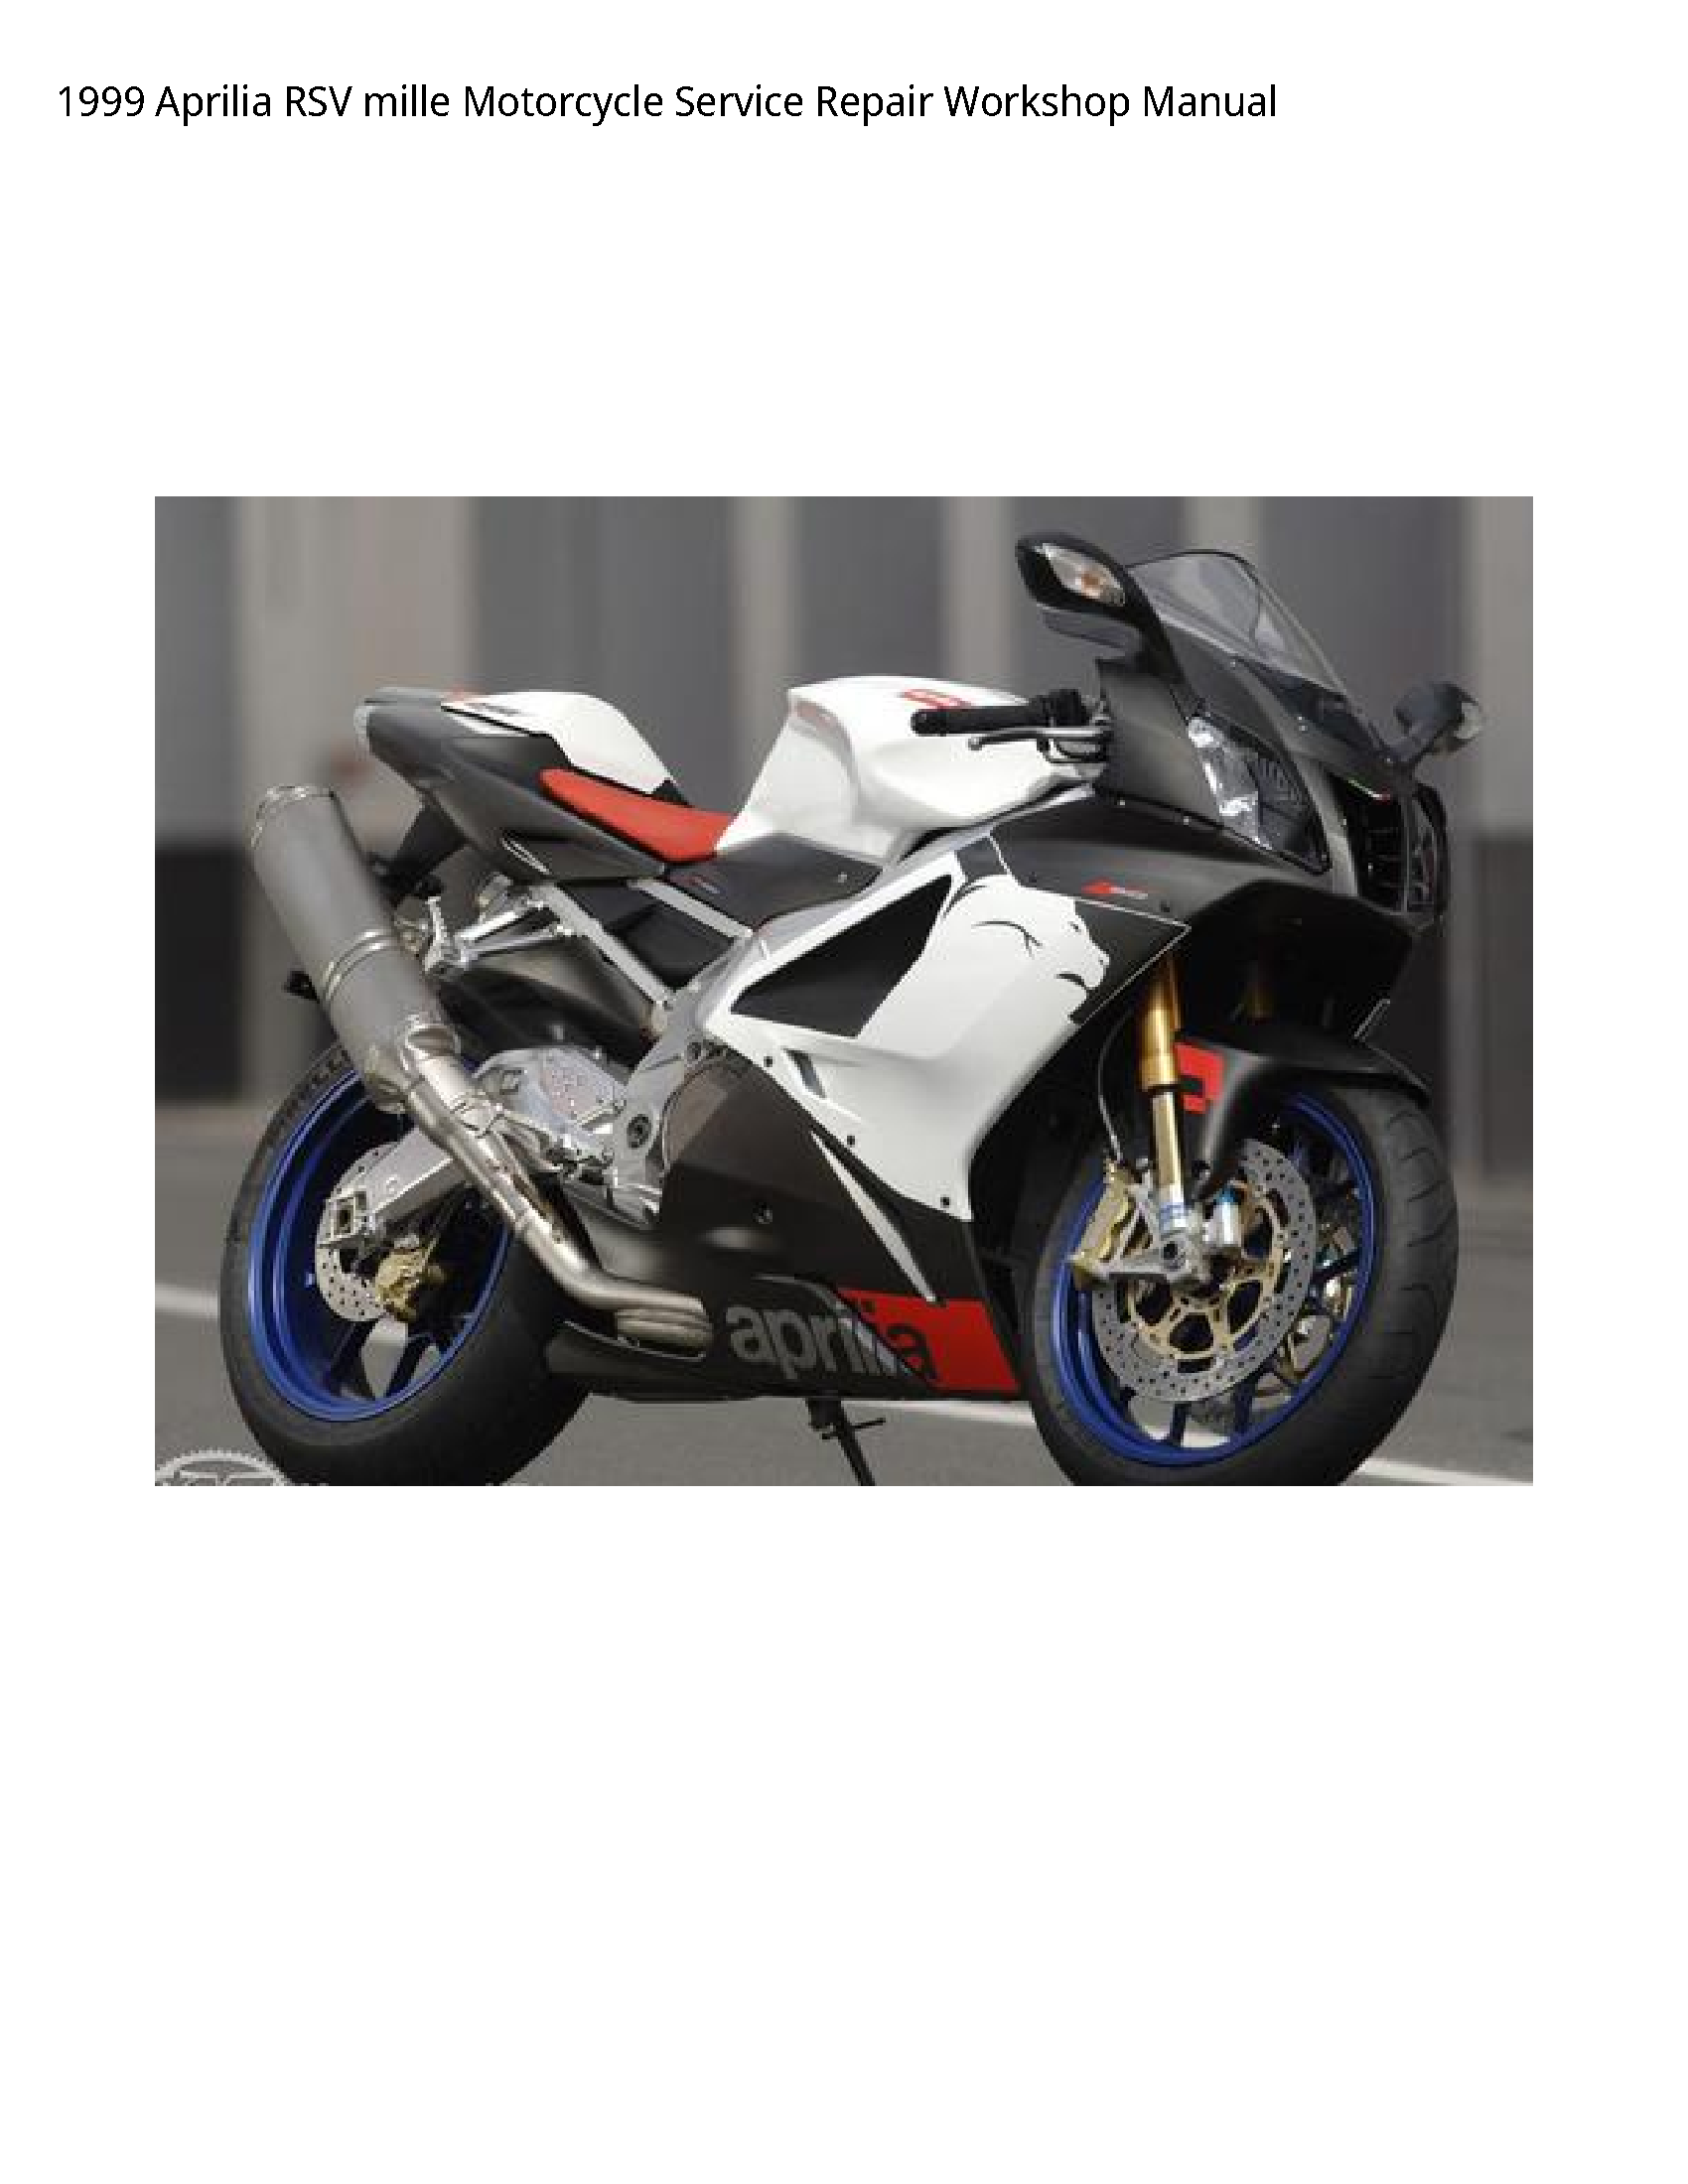 Aprilia RSV mille Motorcycle manual